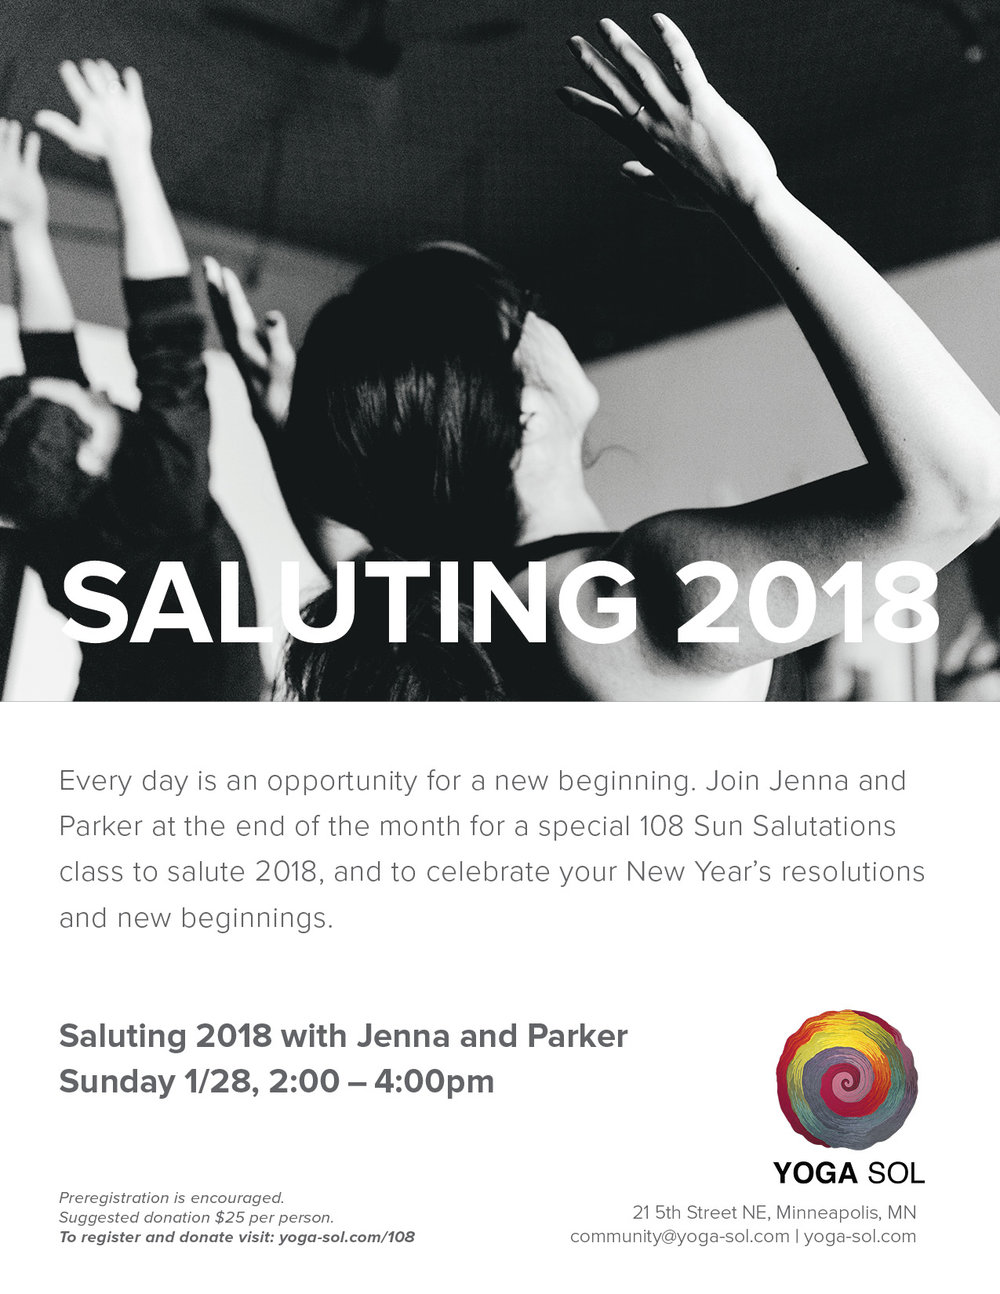 Saluting2018_1.28_2018.jpg